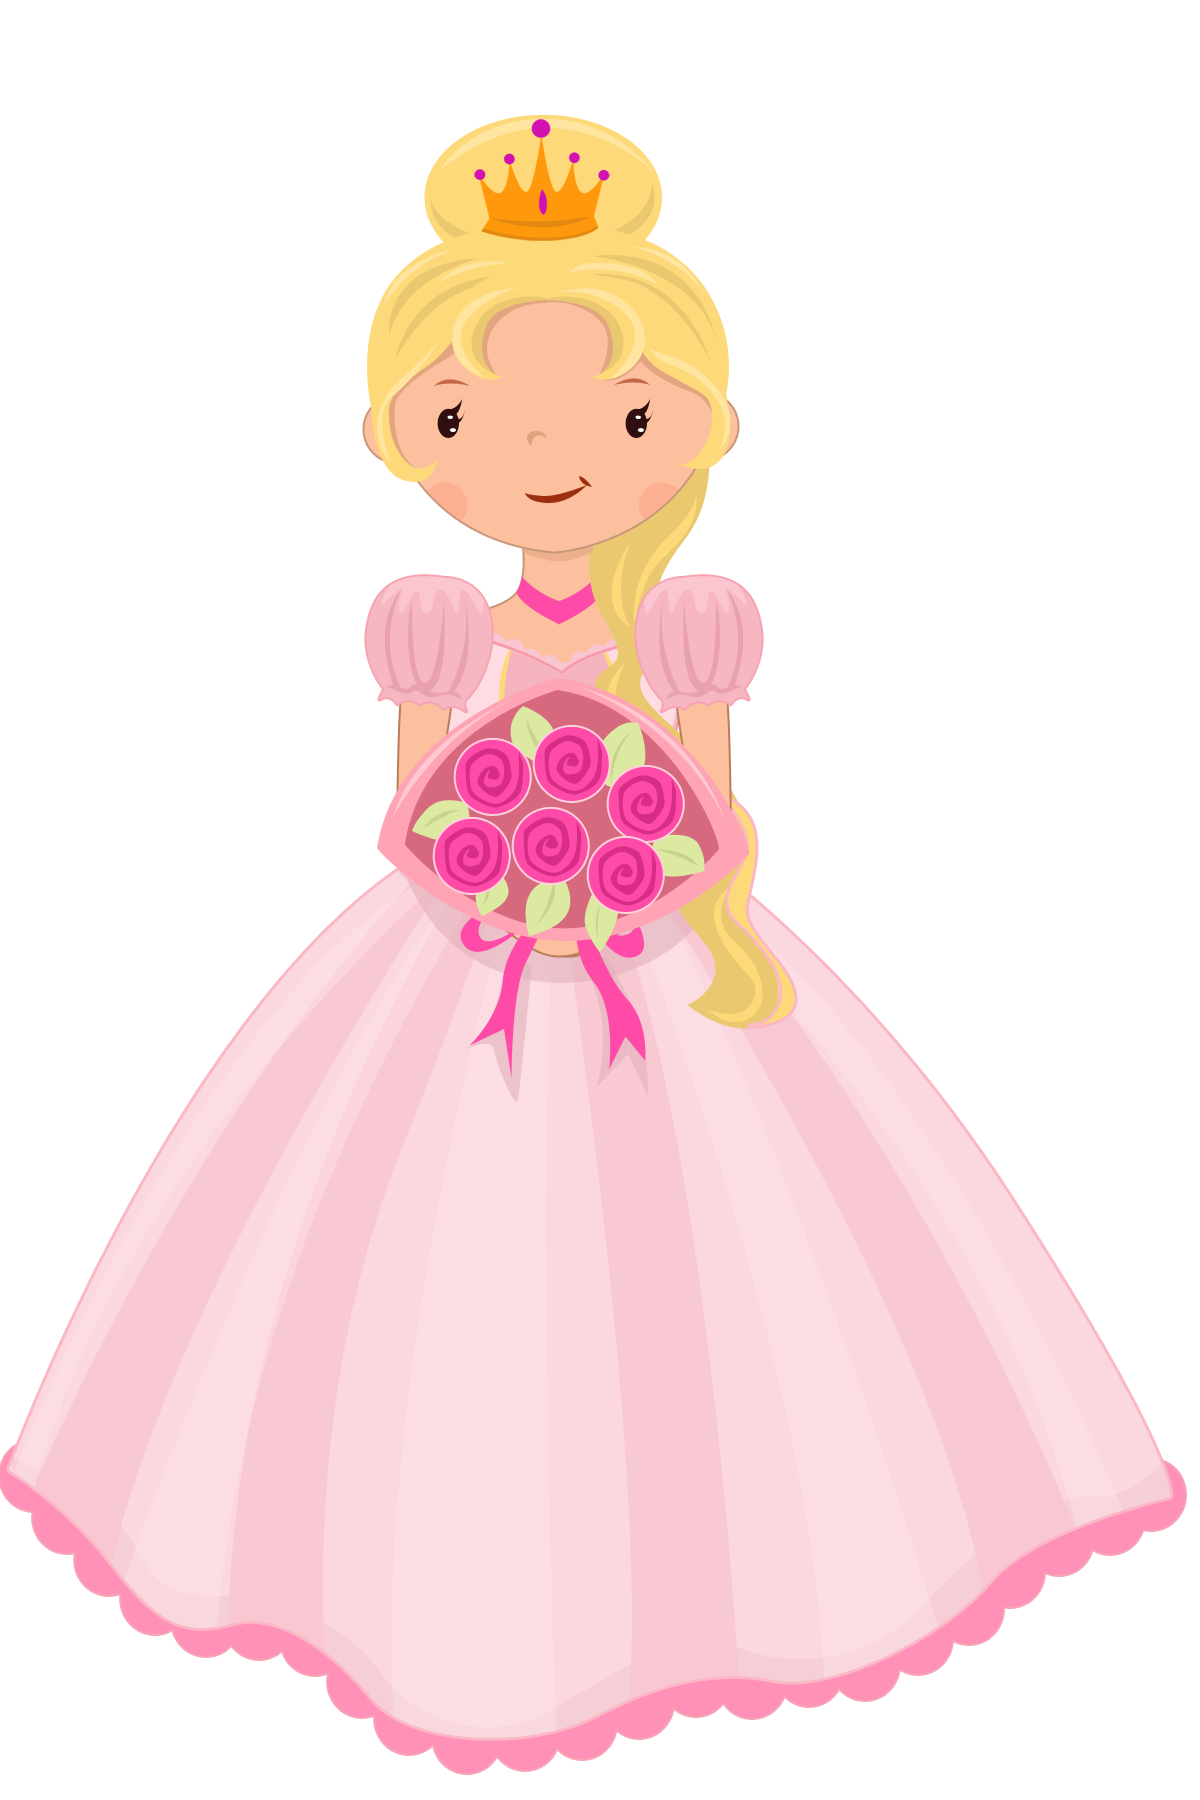 Girly clipart dress hanger. Iqaeu zdokmx png munequitas